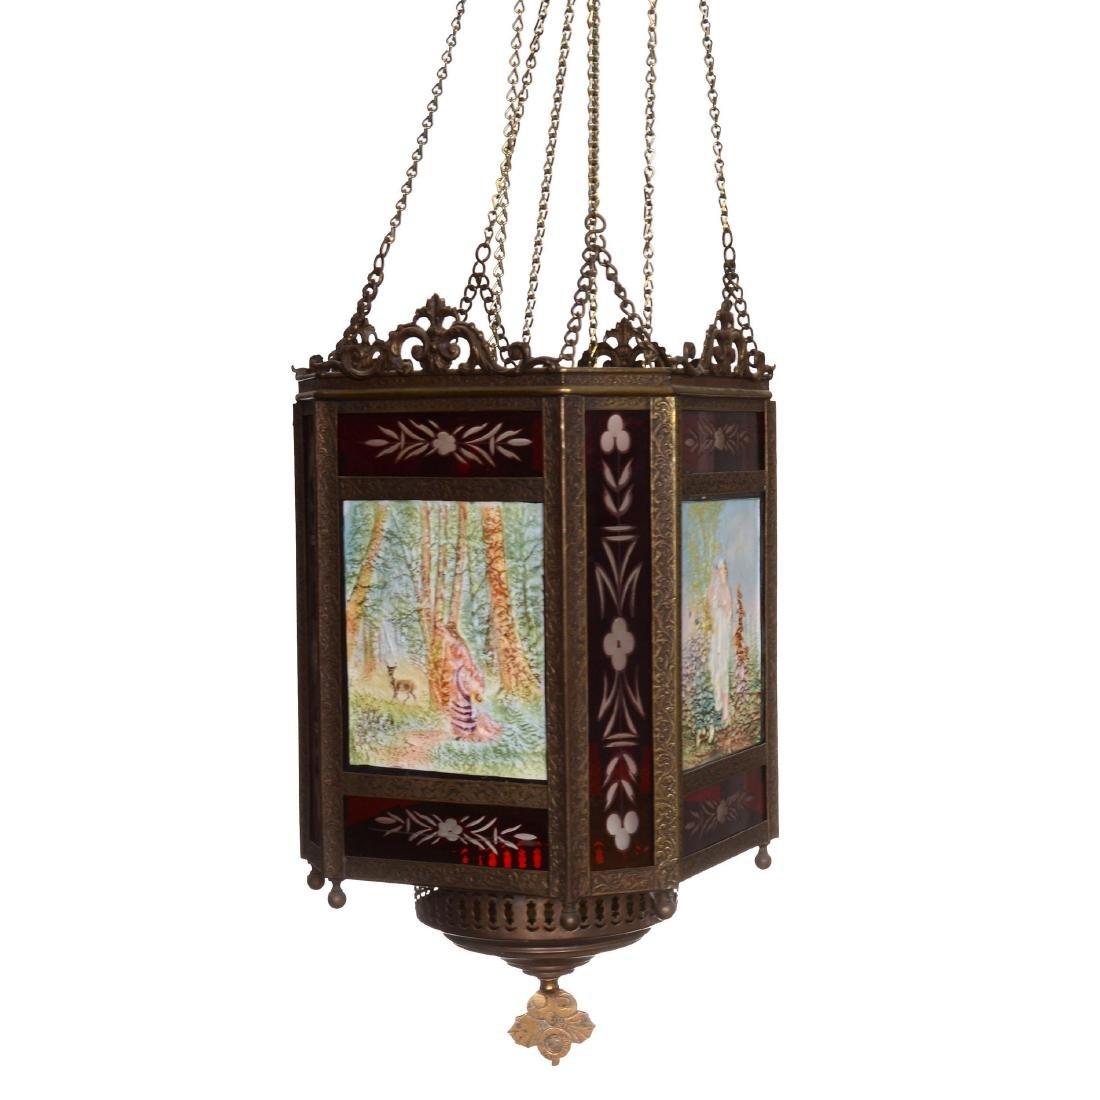 Hanging Hall Lithopane Light Fixture